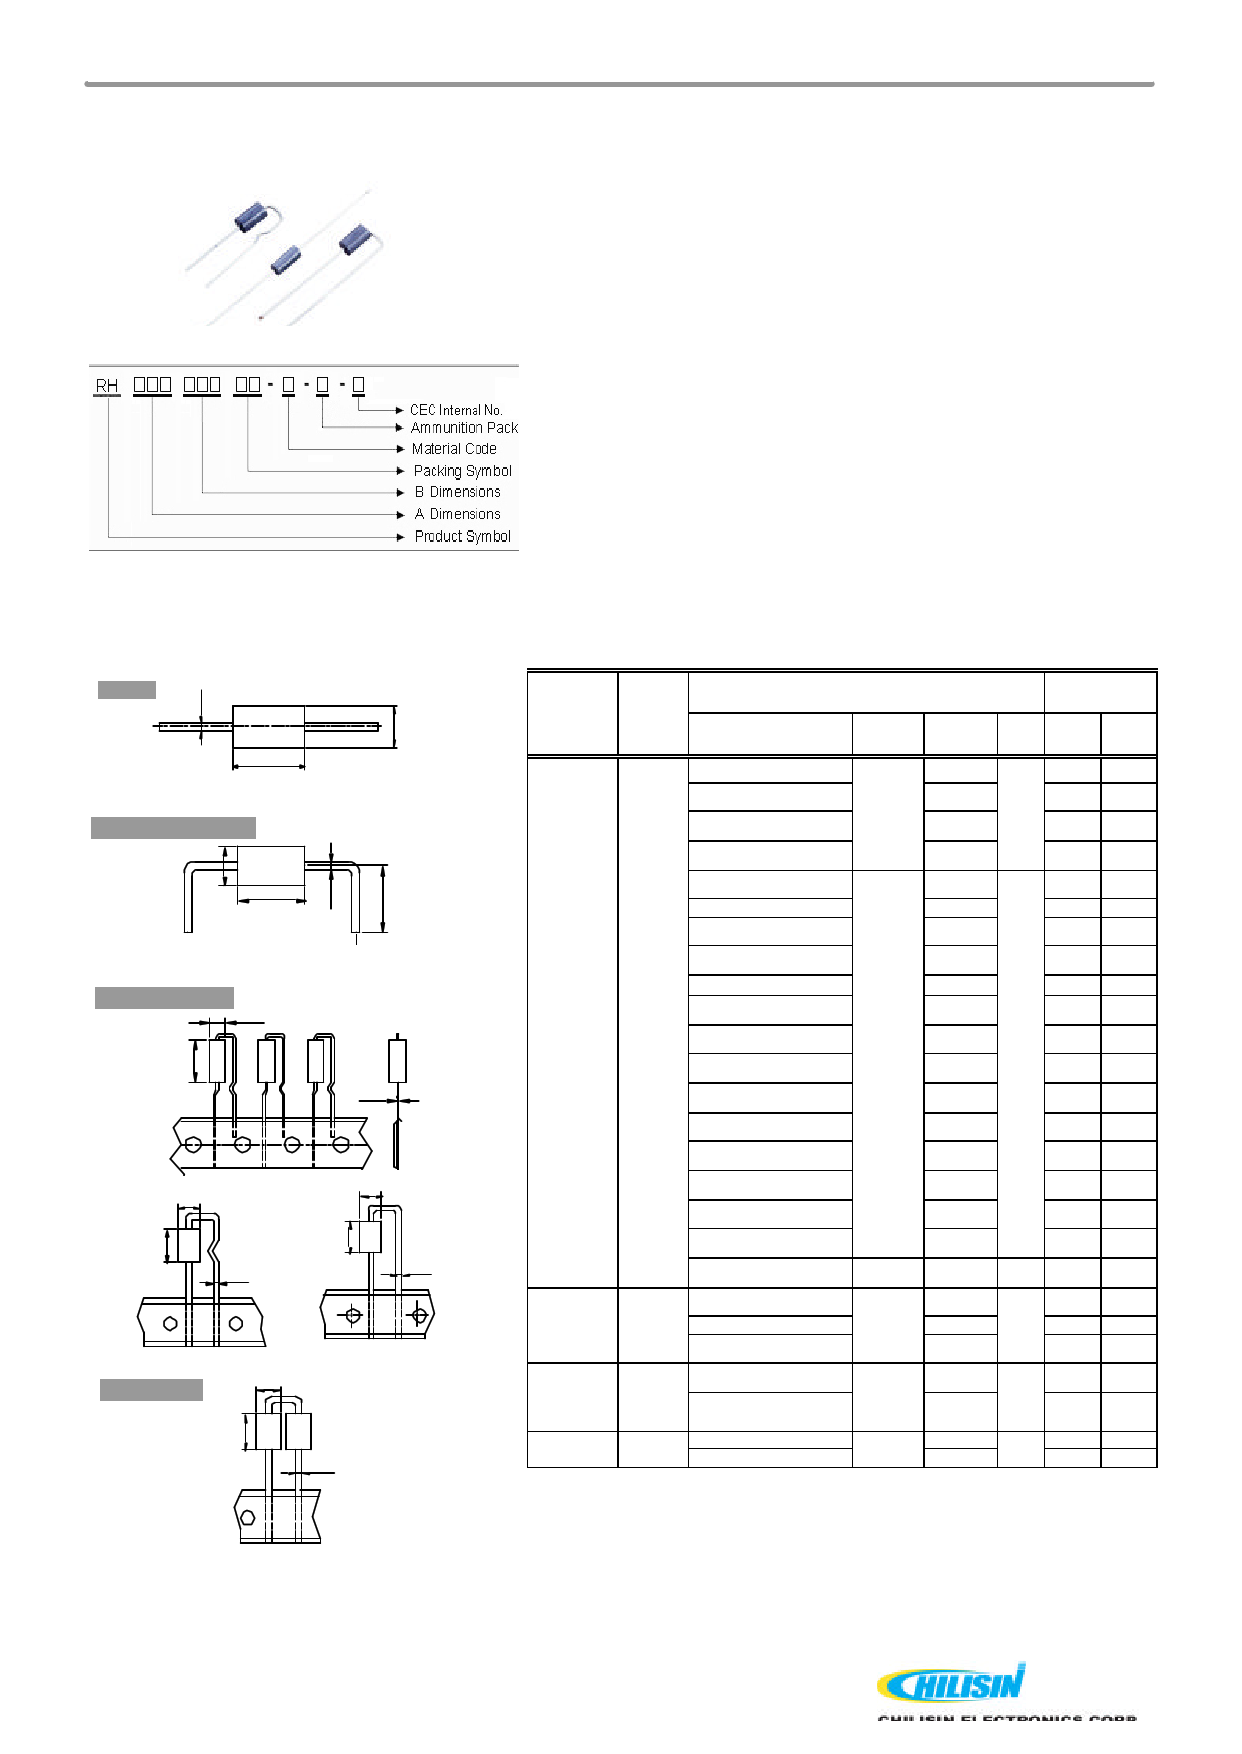 RH03506 데이터시트 및 RH03506 PDF